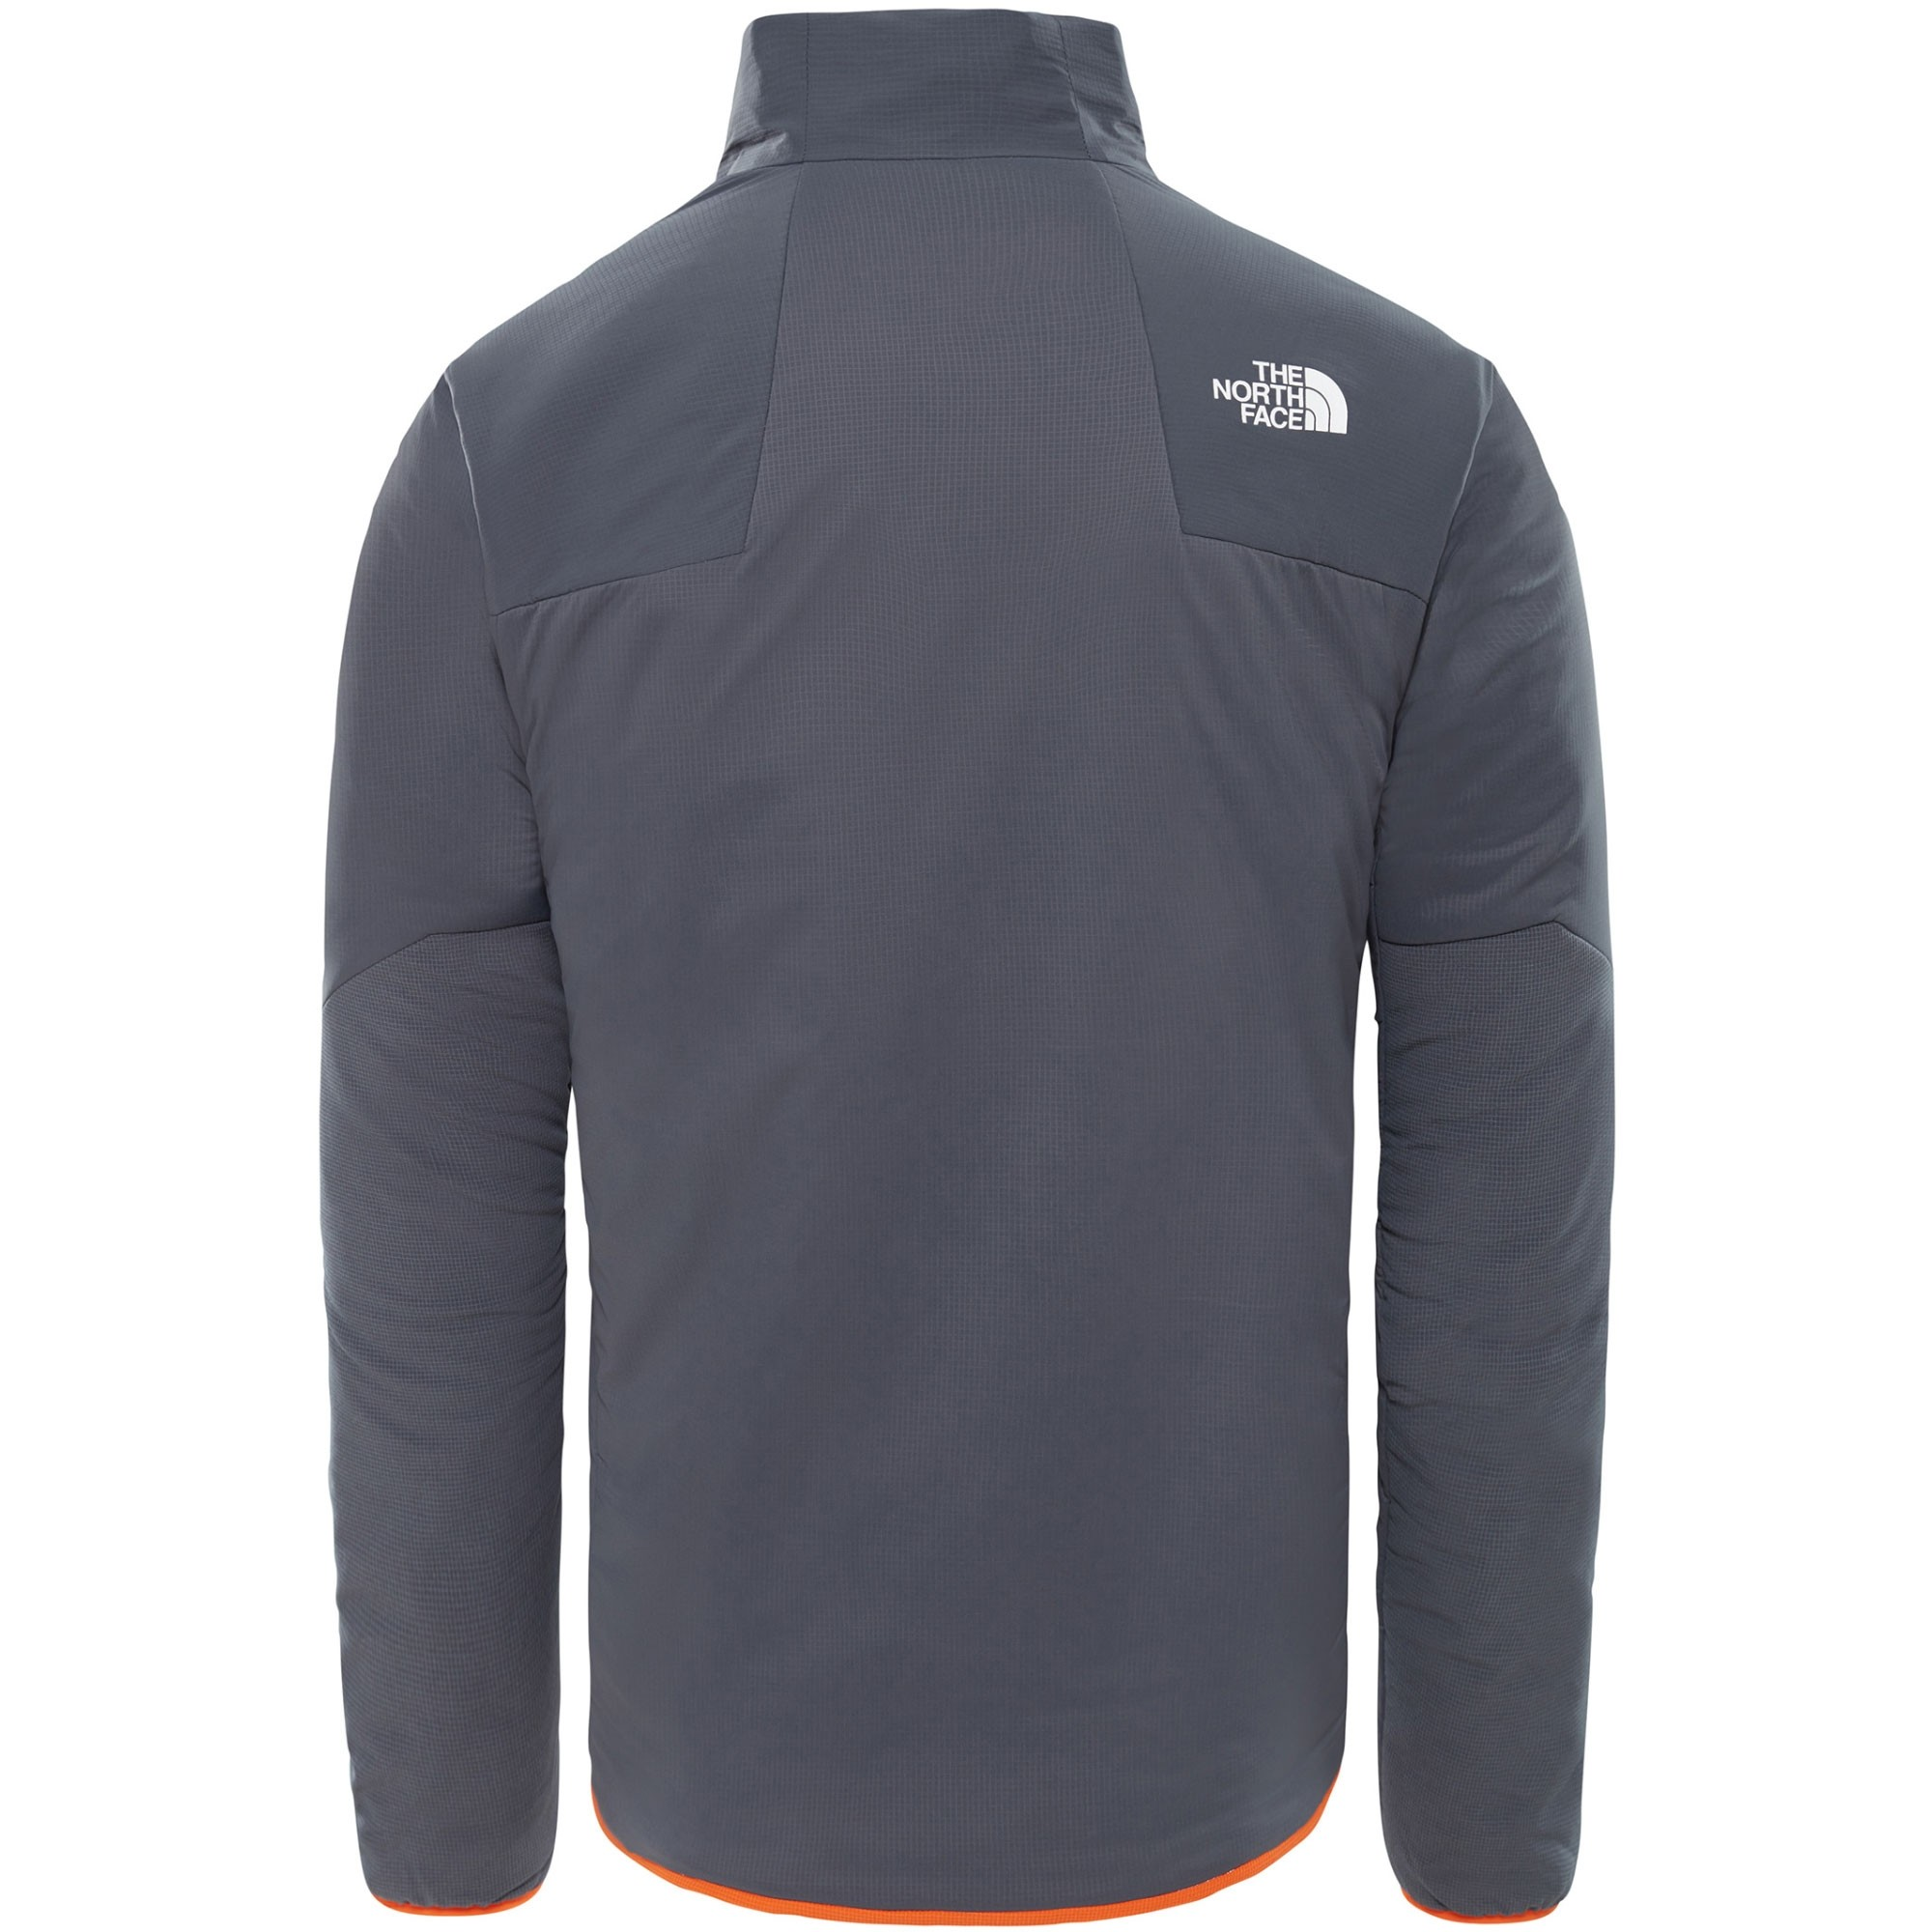 TNF Men's Ventrix Jacket - Vanadis Grey - back